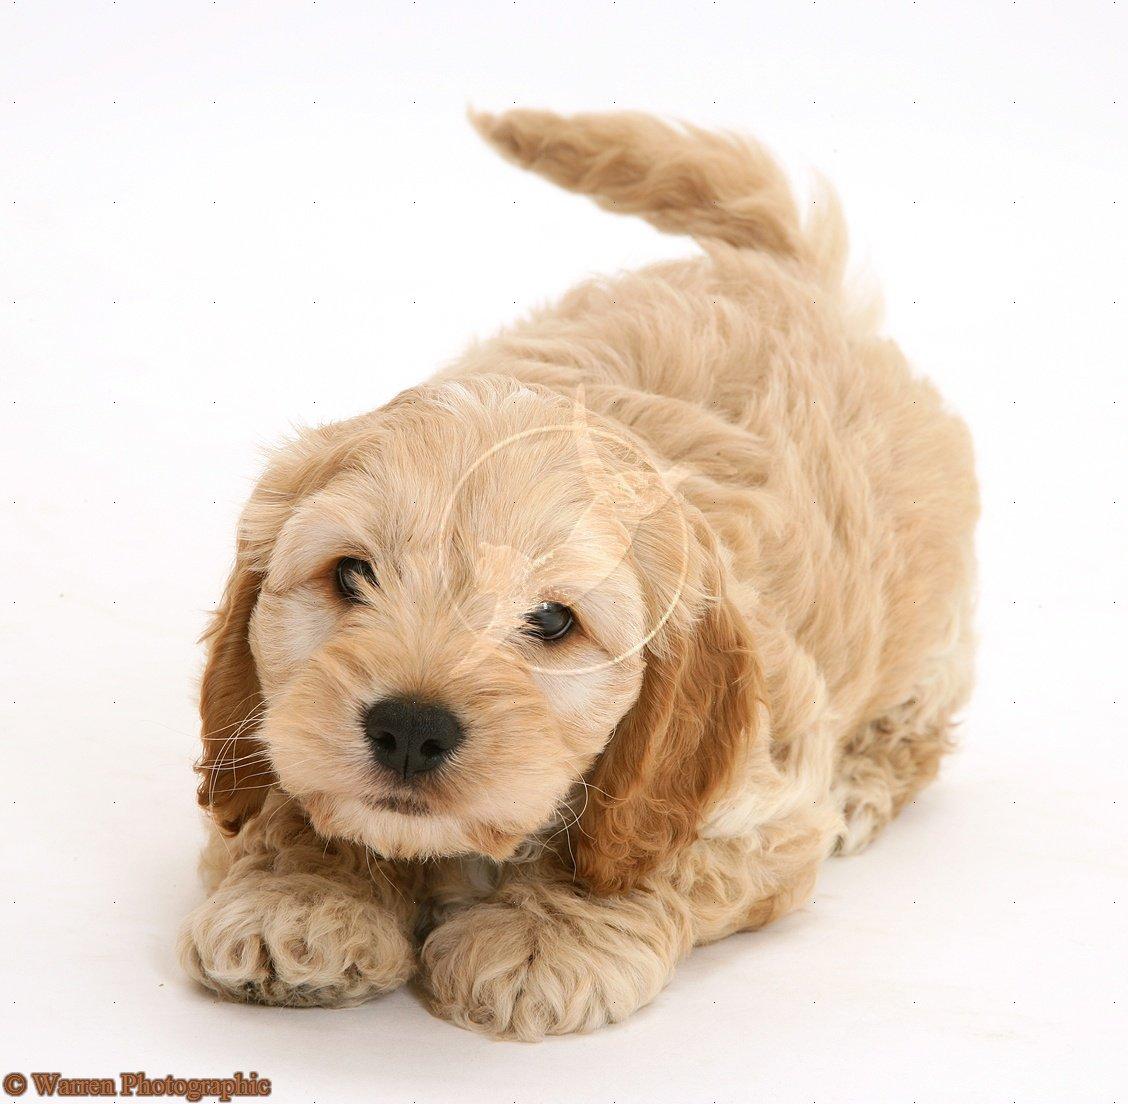 American-Cockapoo-puppy-wallpaper-wp5602850